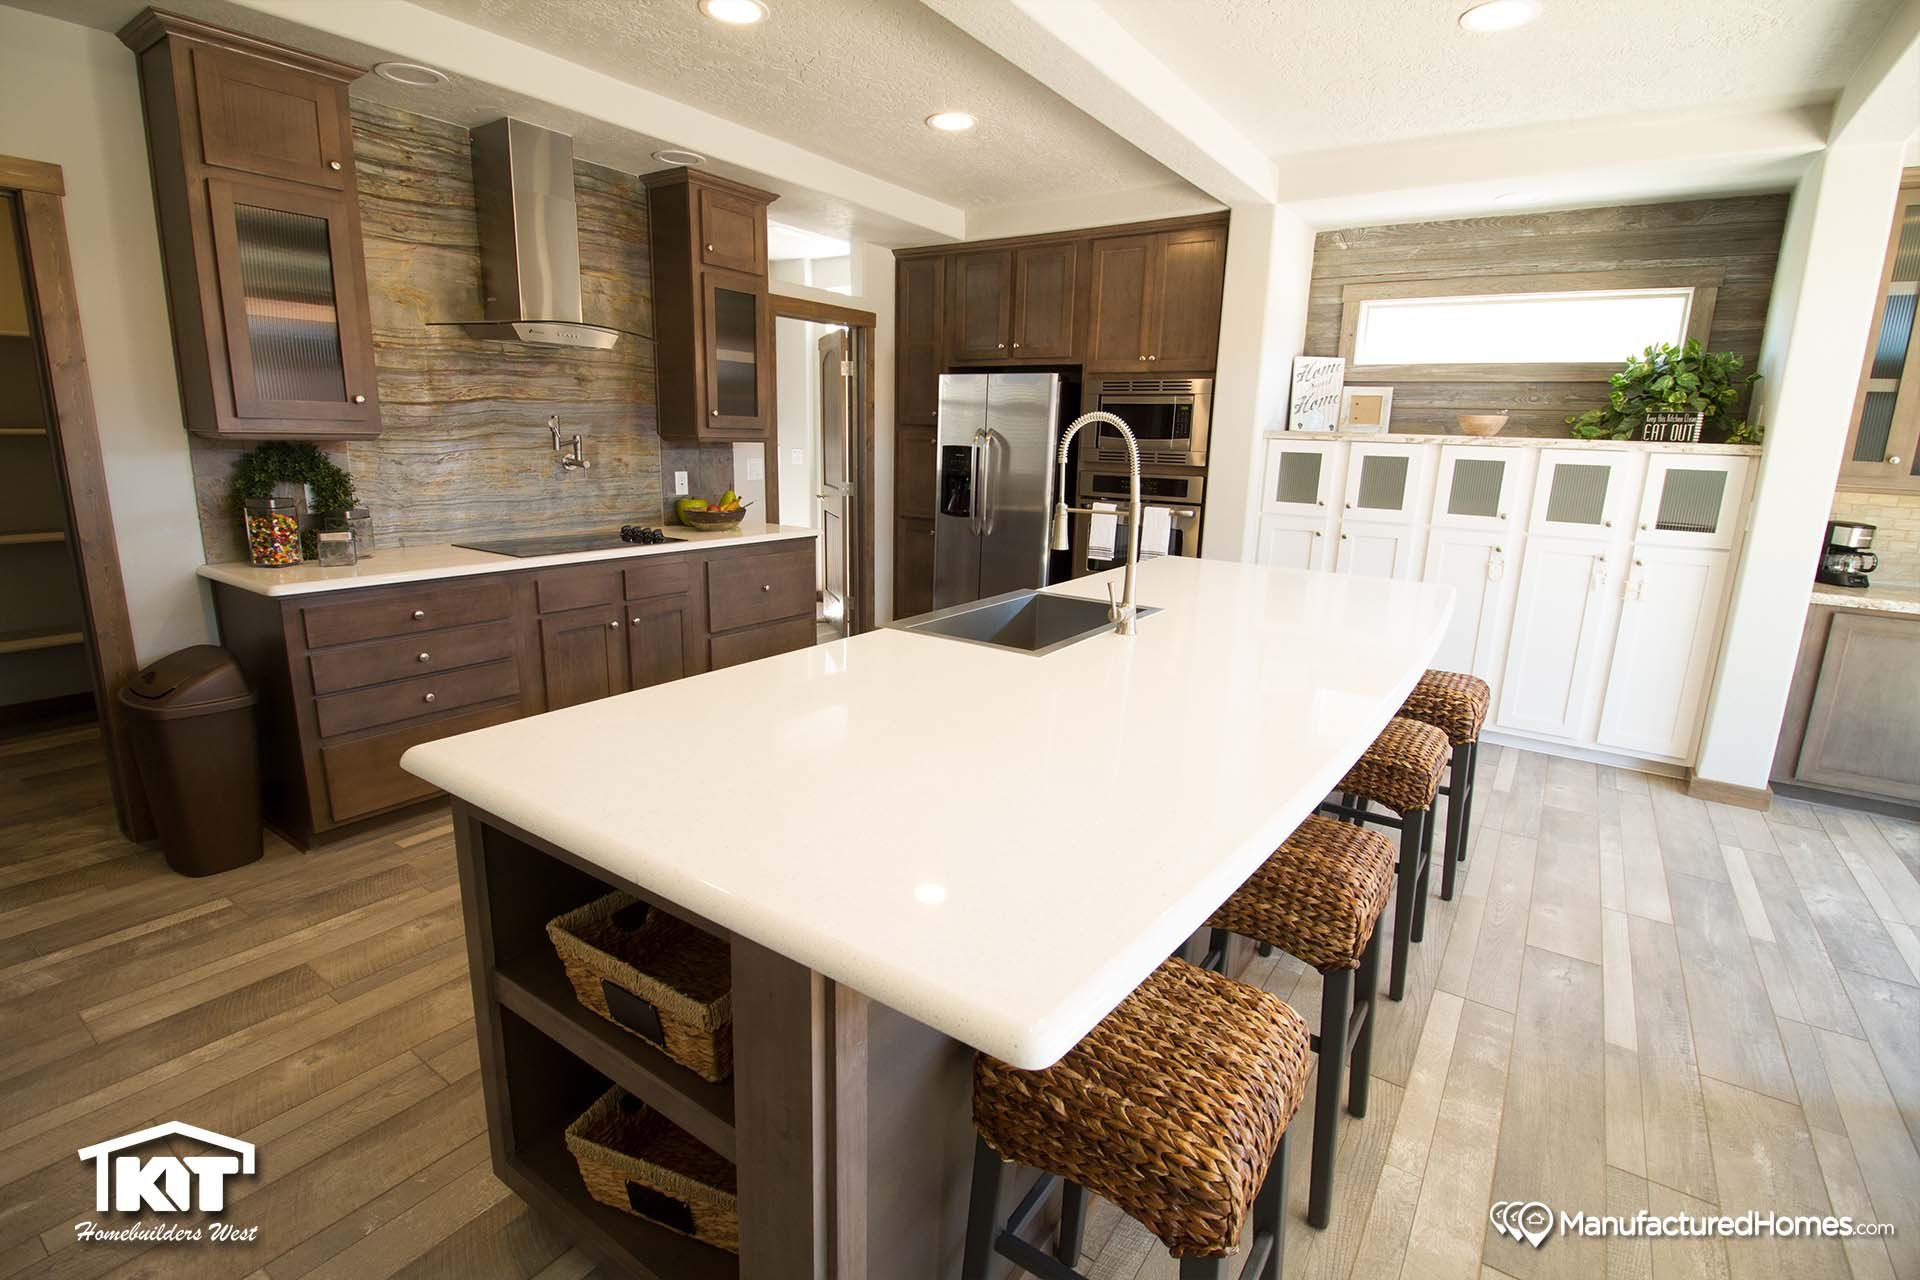 Grand Manor 6009 Kitchen Manufactured home